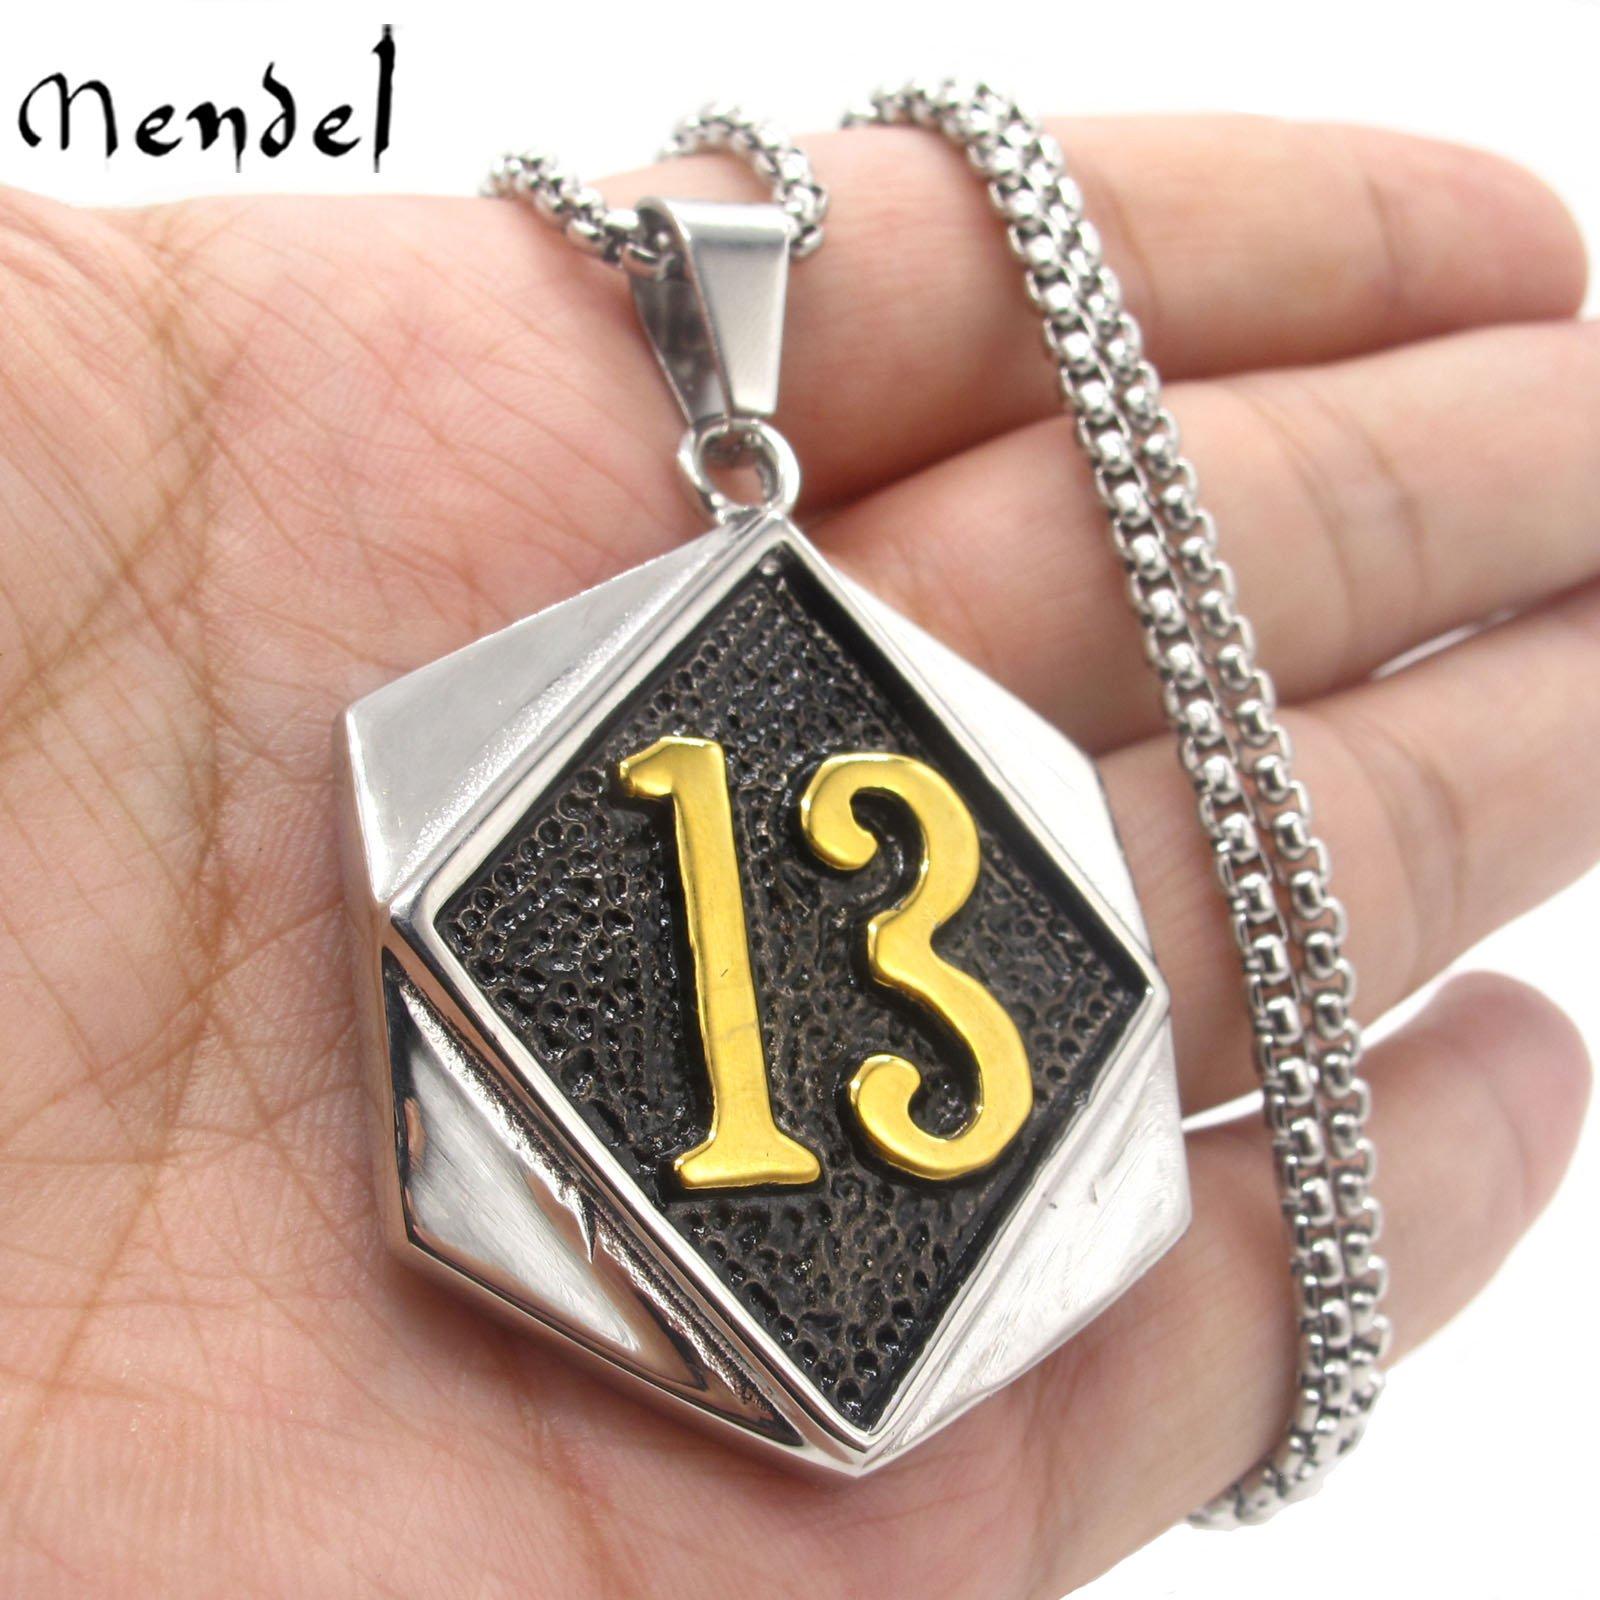 MENDEL Mens Gold Motorcycle Biker Number 13 Pendant Necklace Stainless Steel Men